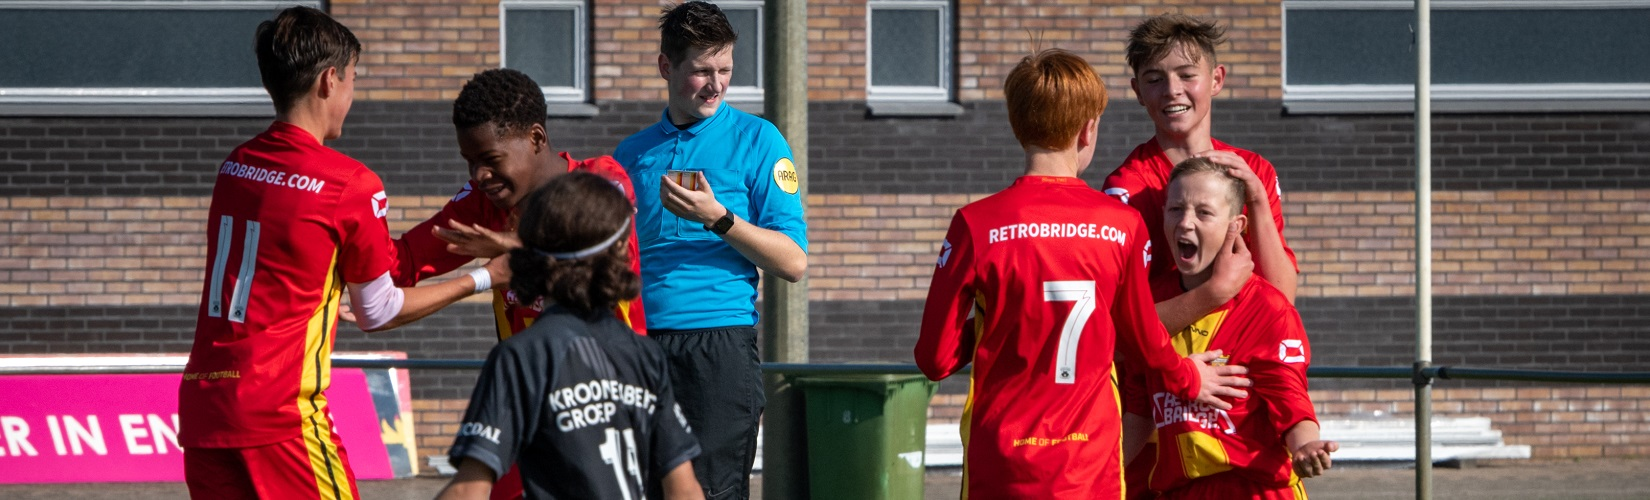 Almere City Fc O14 Go Ahead Eagles O14 (1) Header